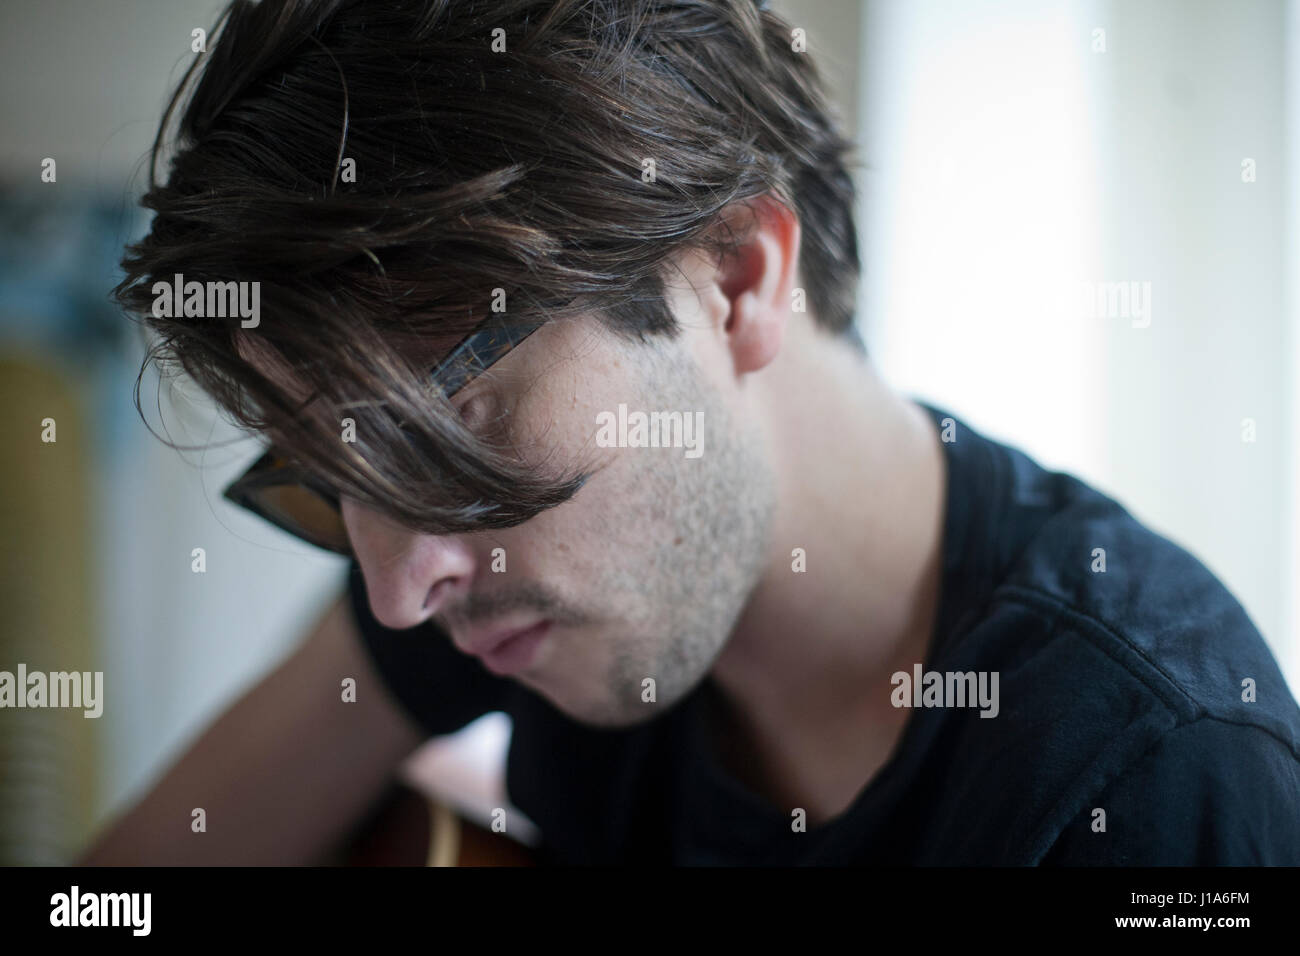 Retrato de un hombre joven guapo Imagen De Stock